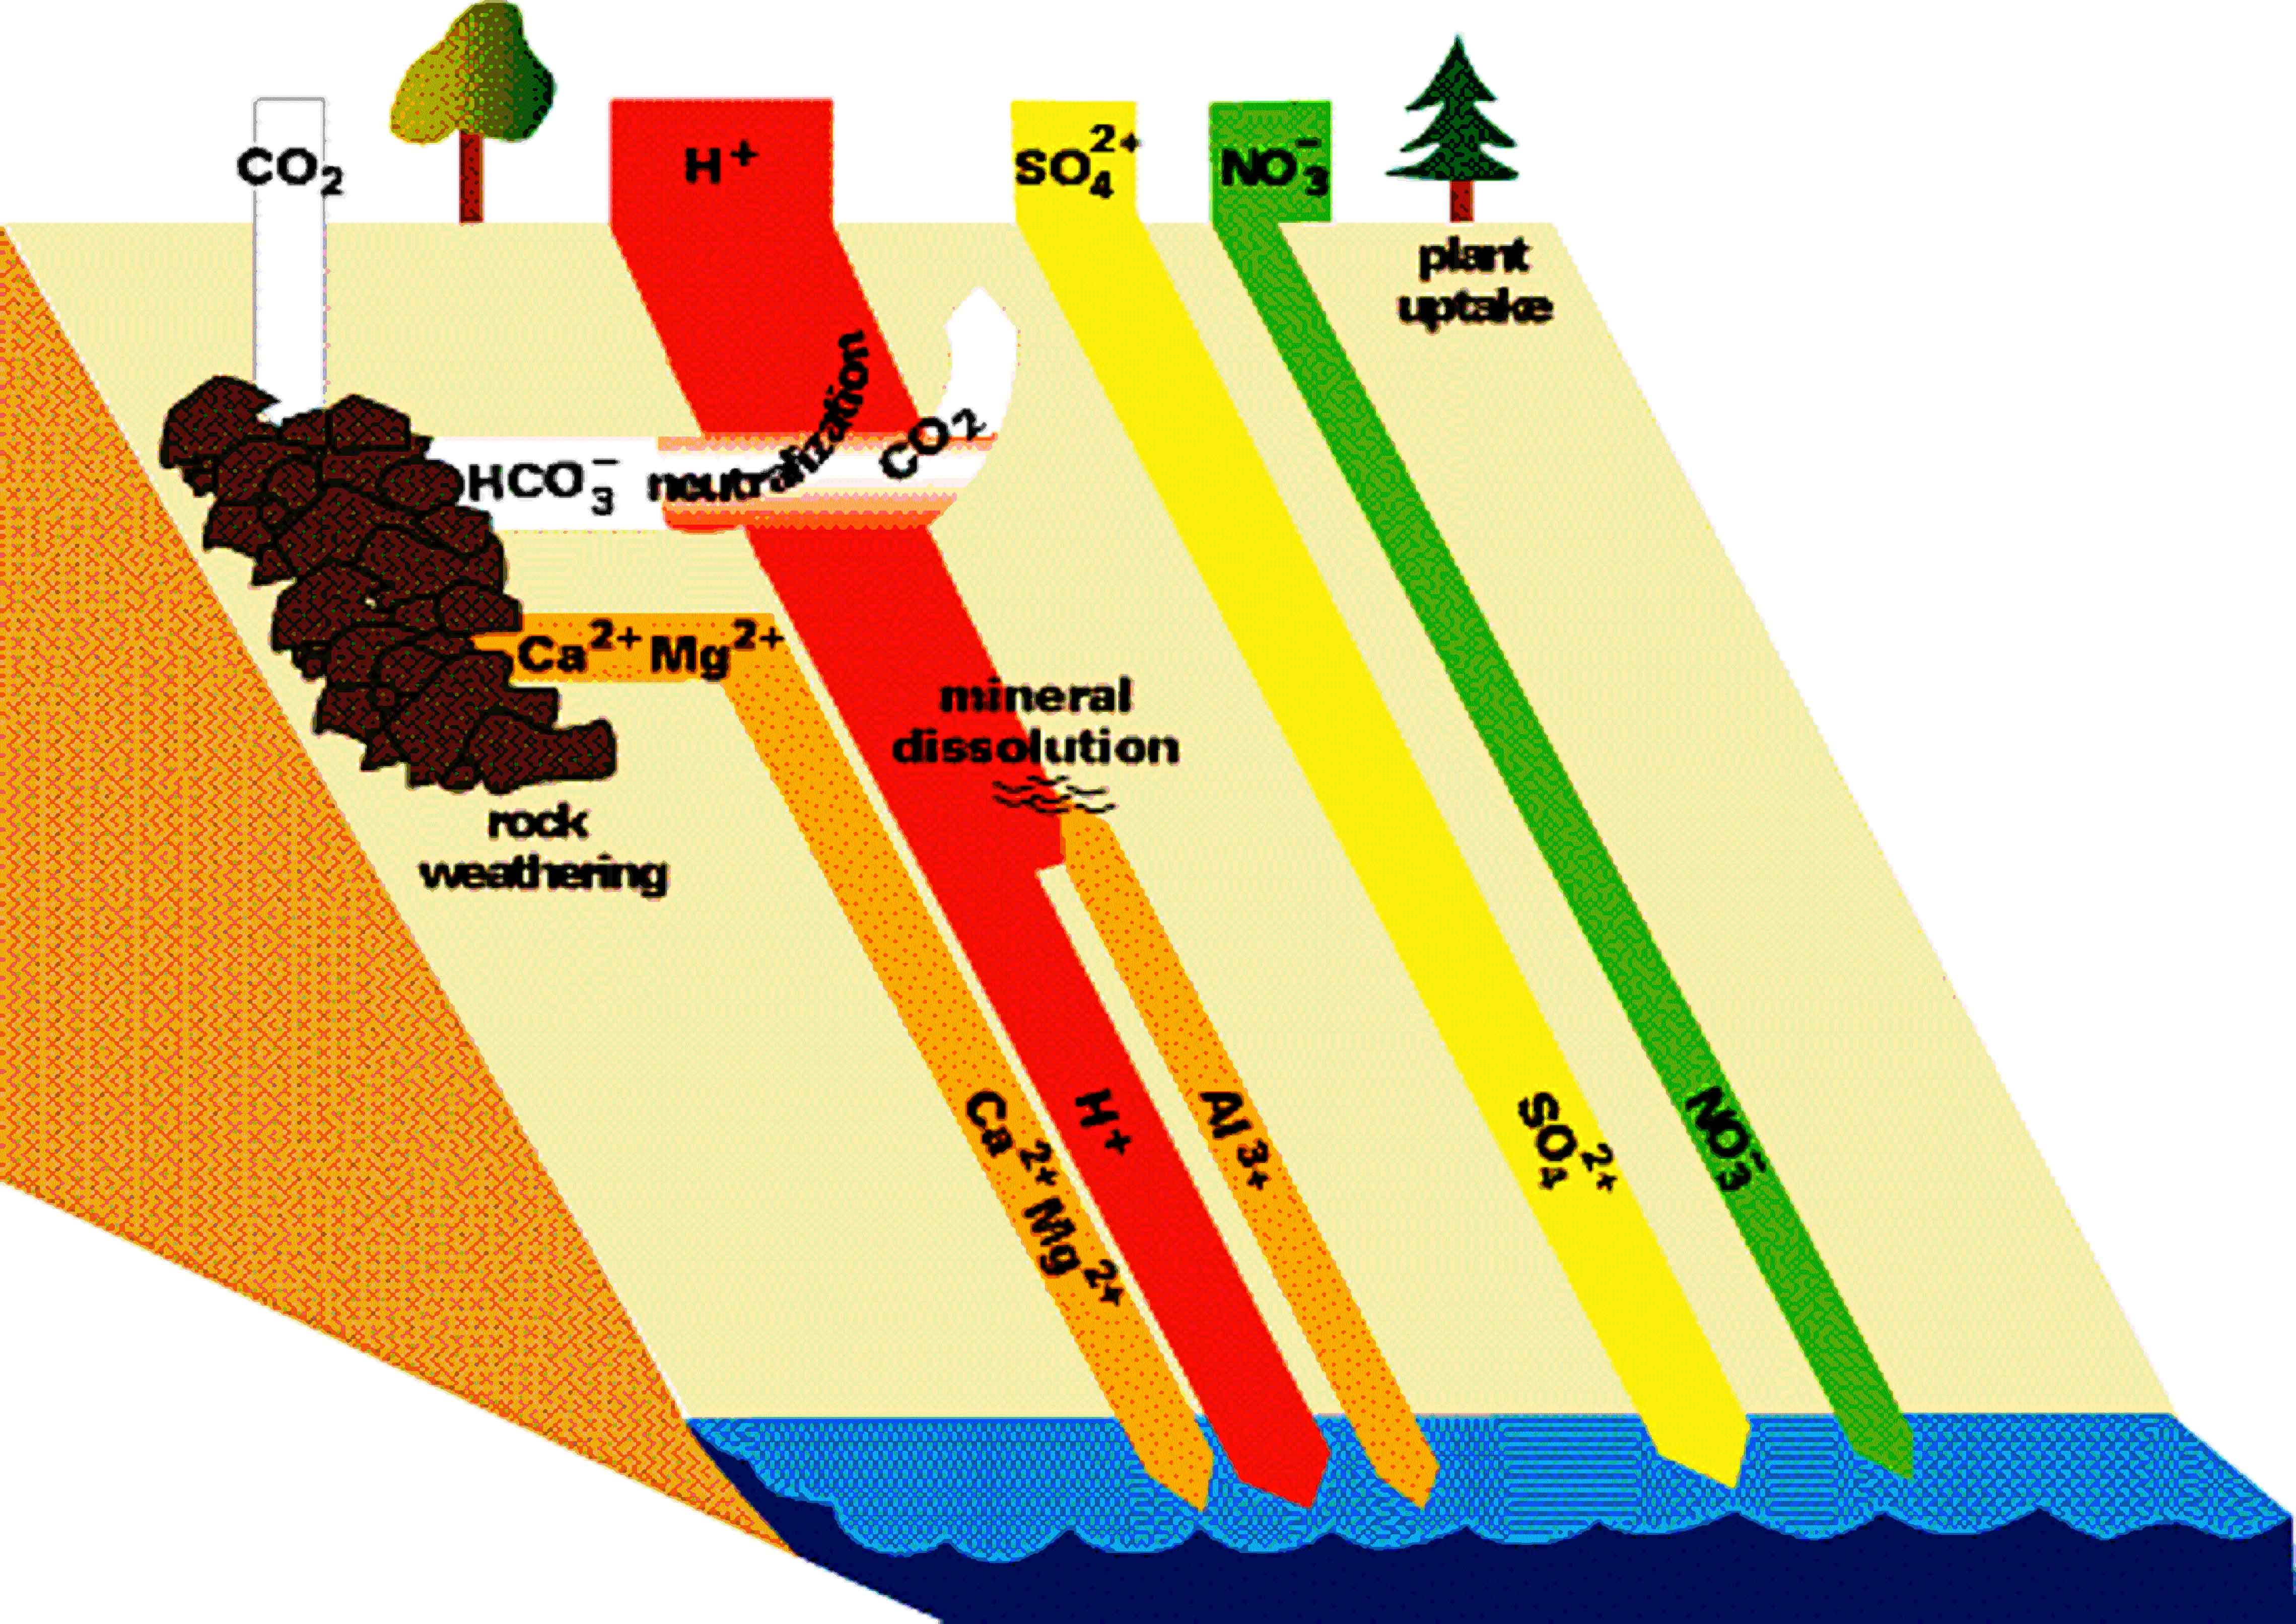 pollution, acid rain, and systems thinking Acid Rain Trees